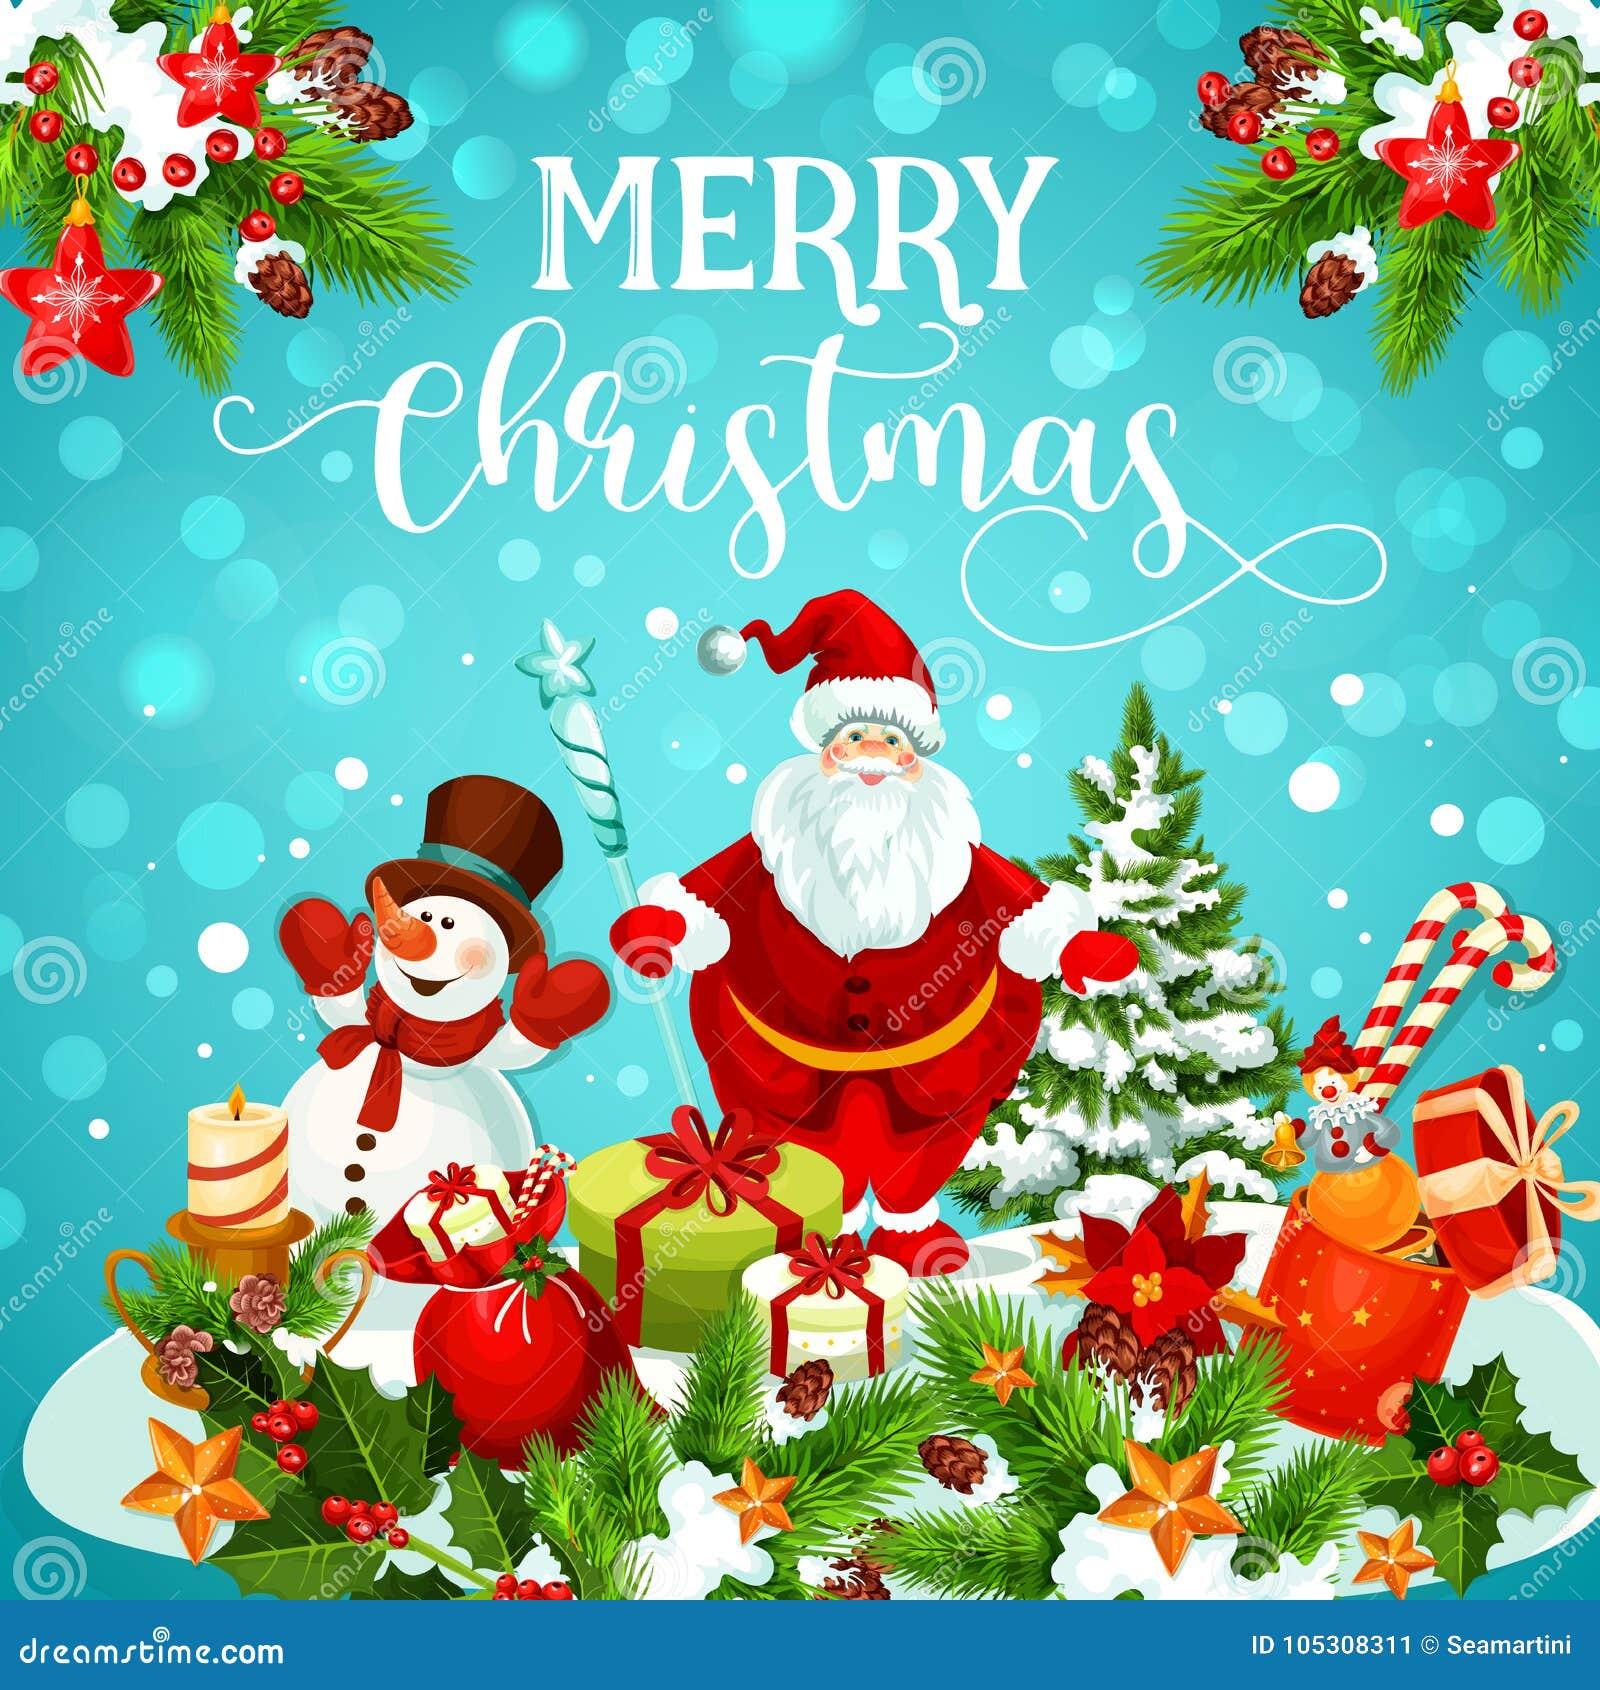 Christmas Greeting Card Of Snowman, Santa And Gift Stock